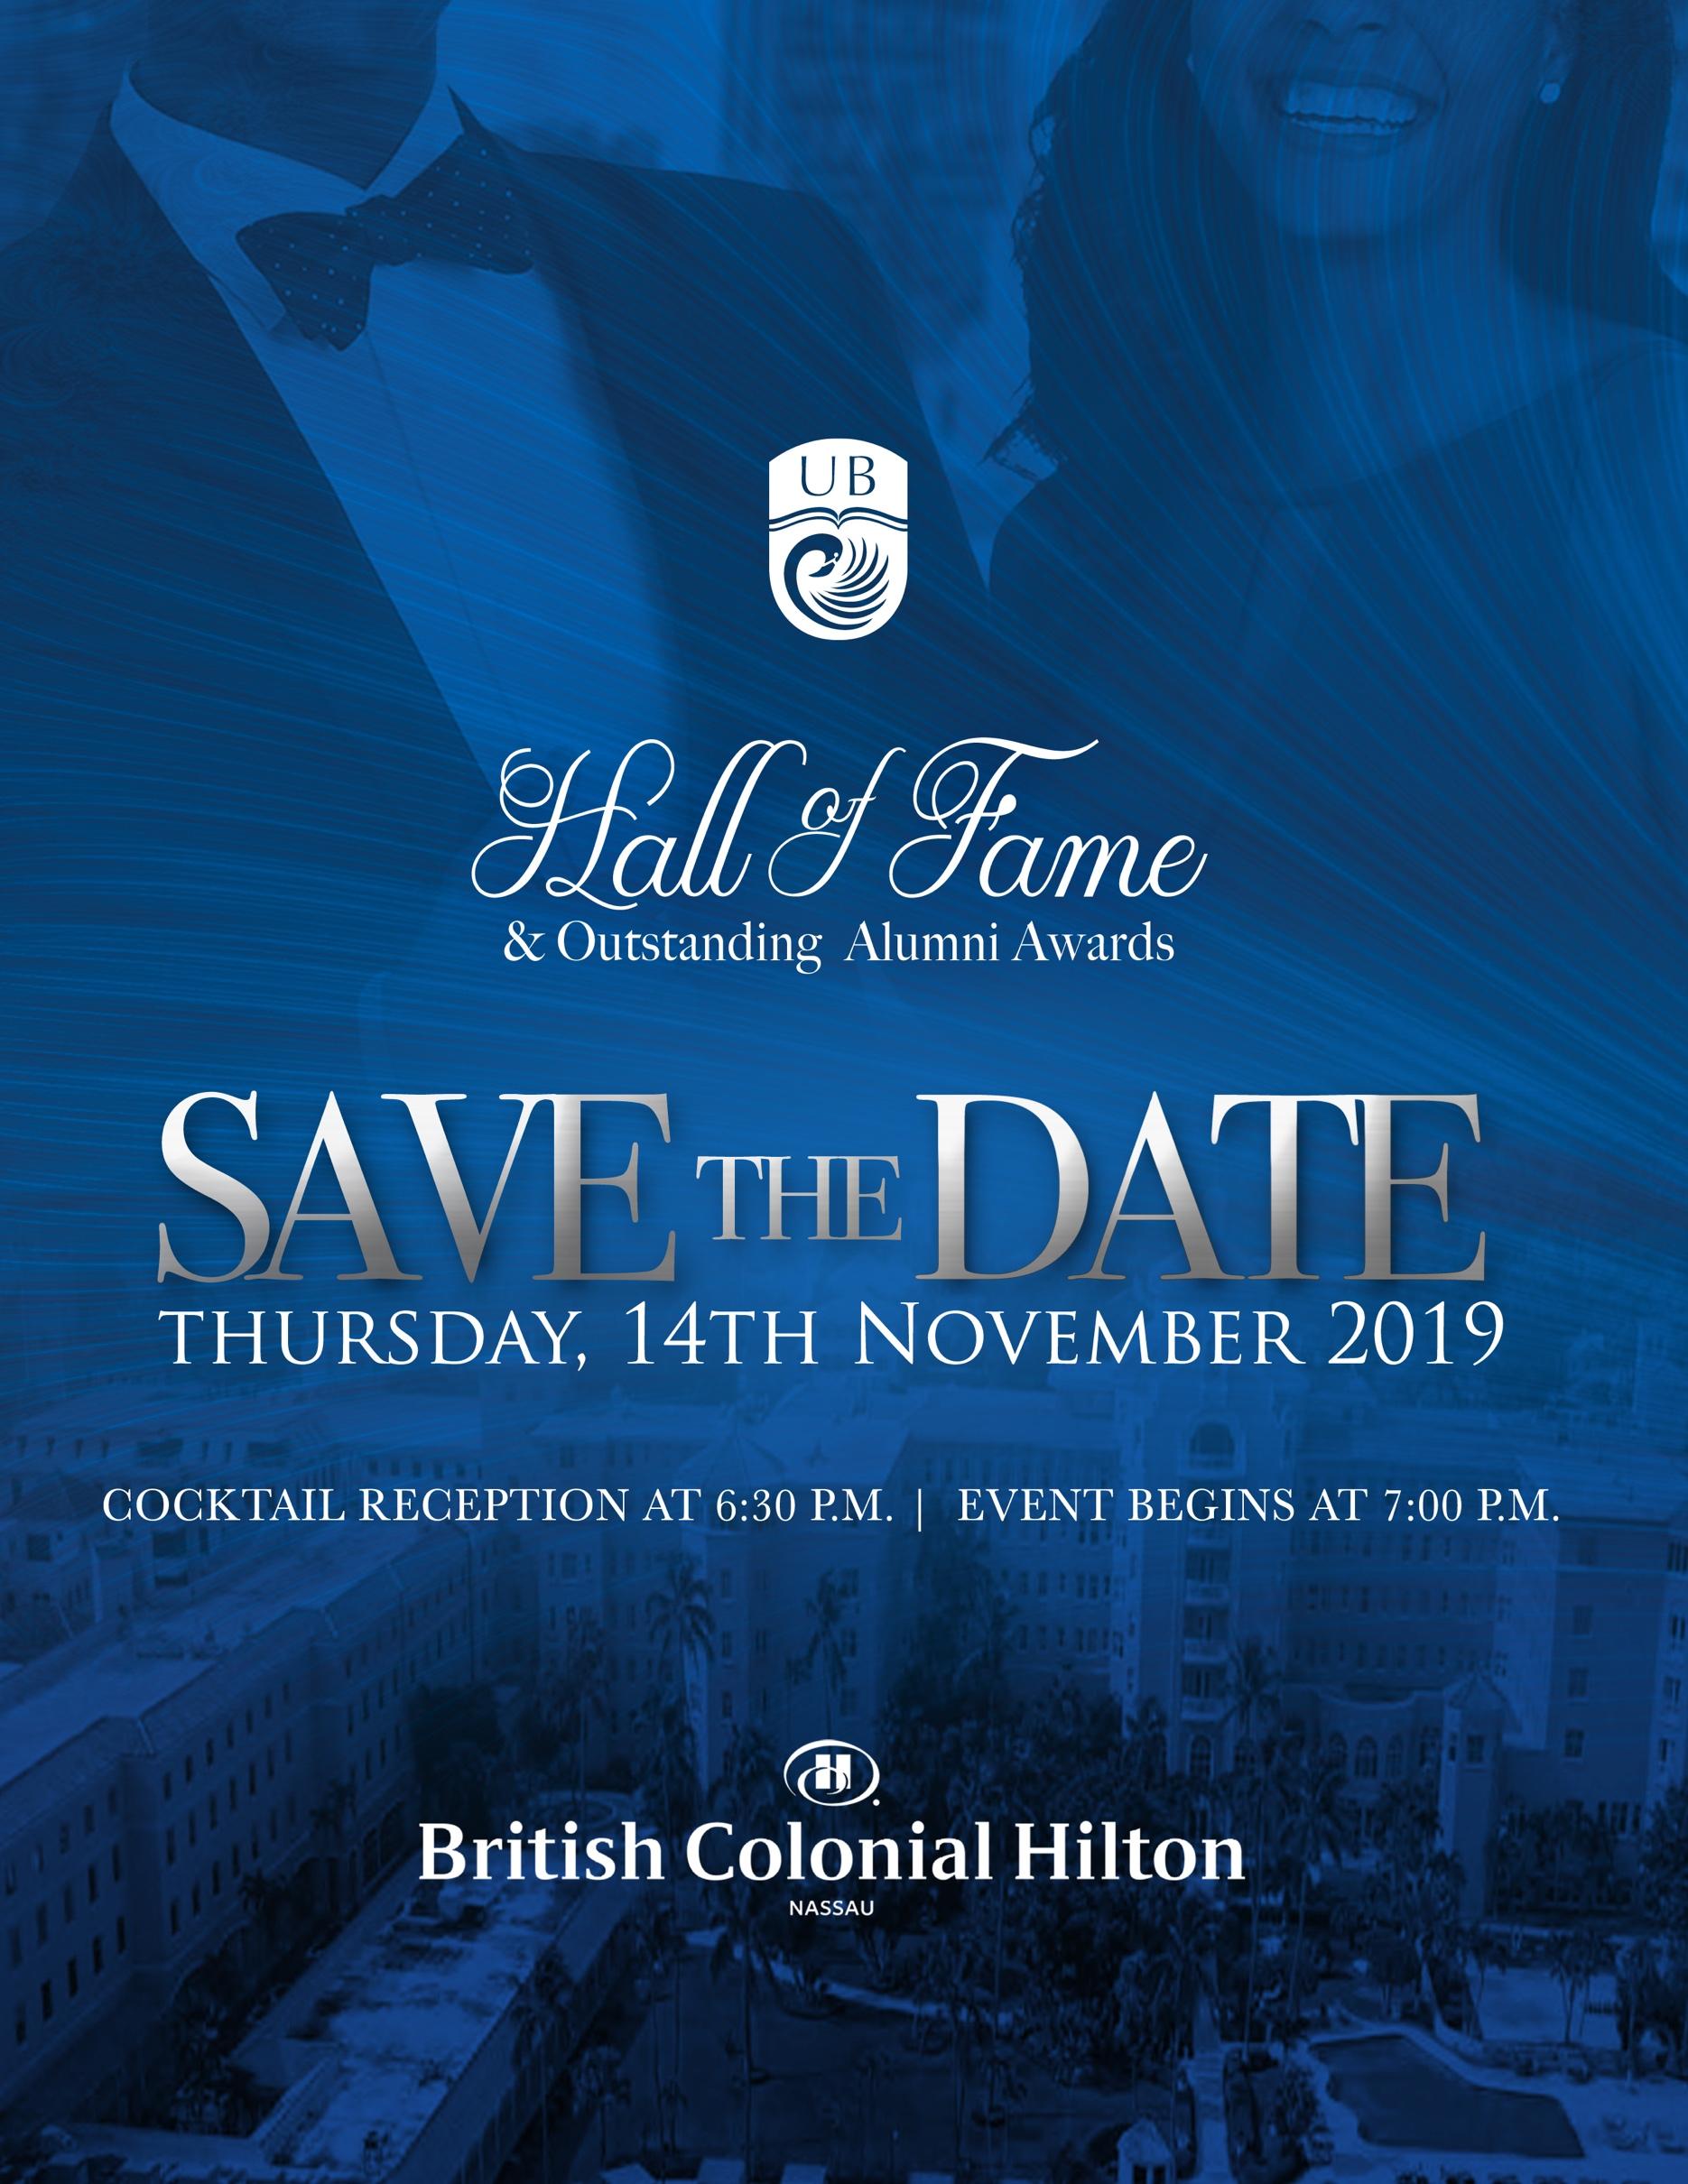 at The British Colonial Hilton